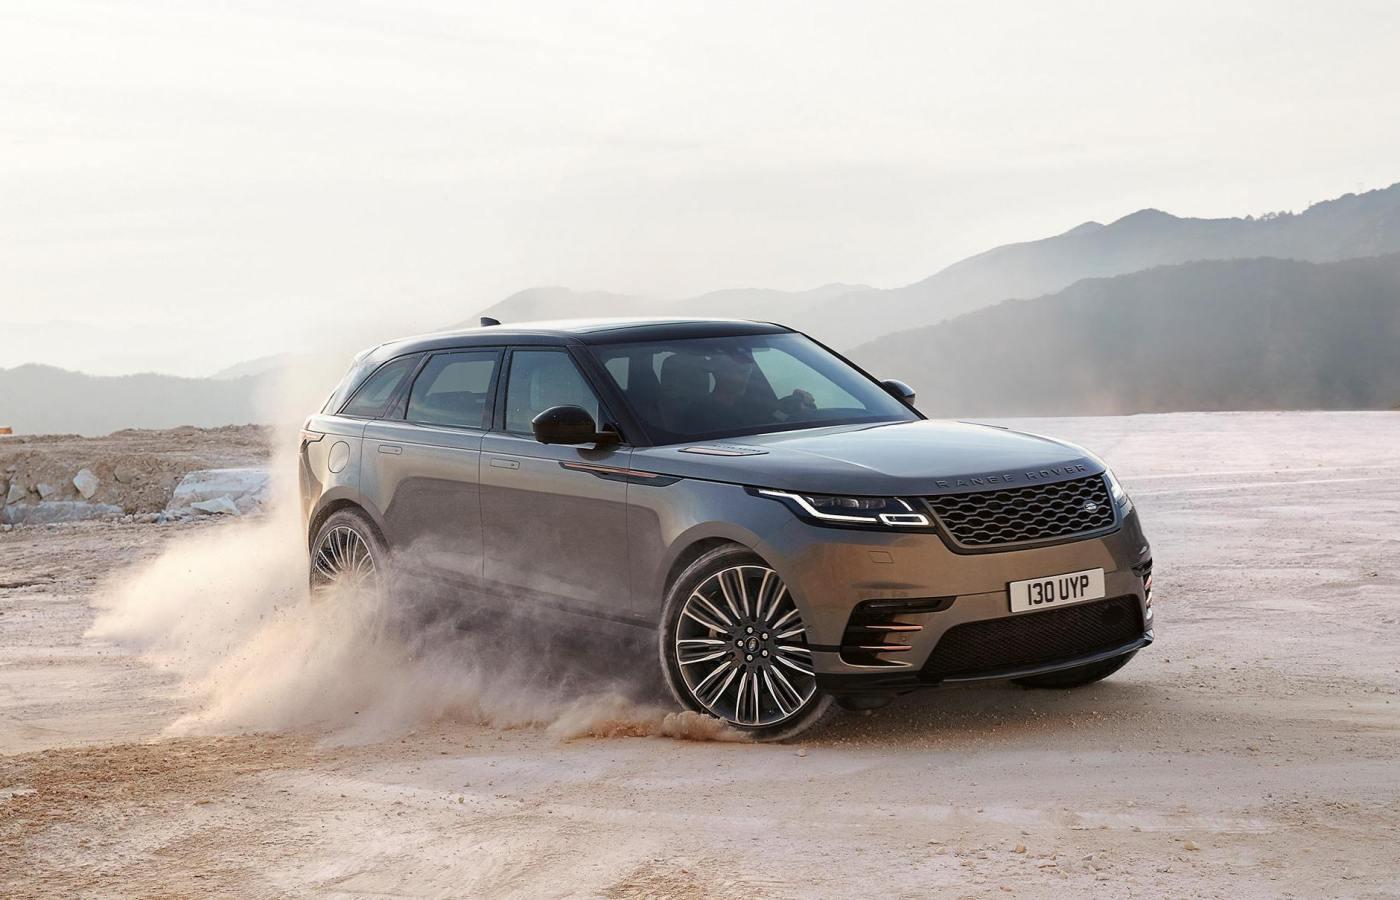 Club Land Rover Velar